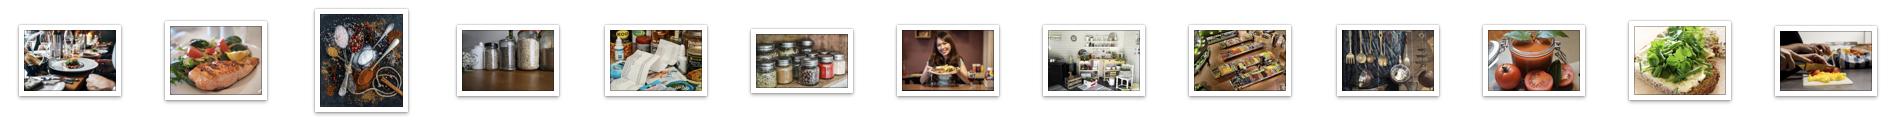 CookingAtHome-RoyaltyFreePhotos3